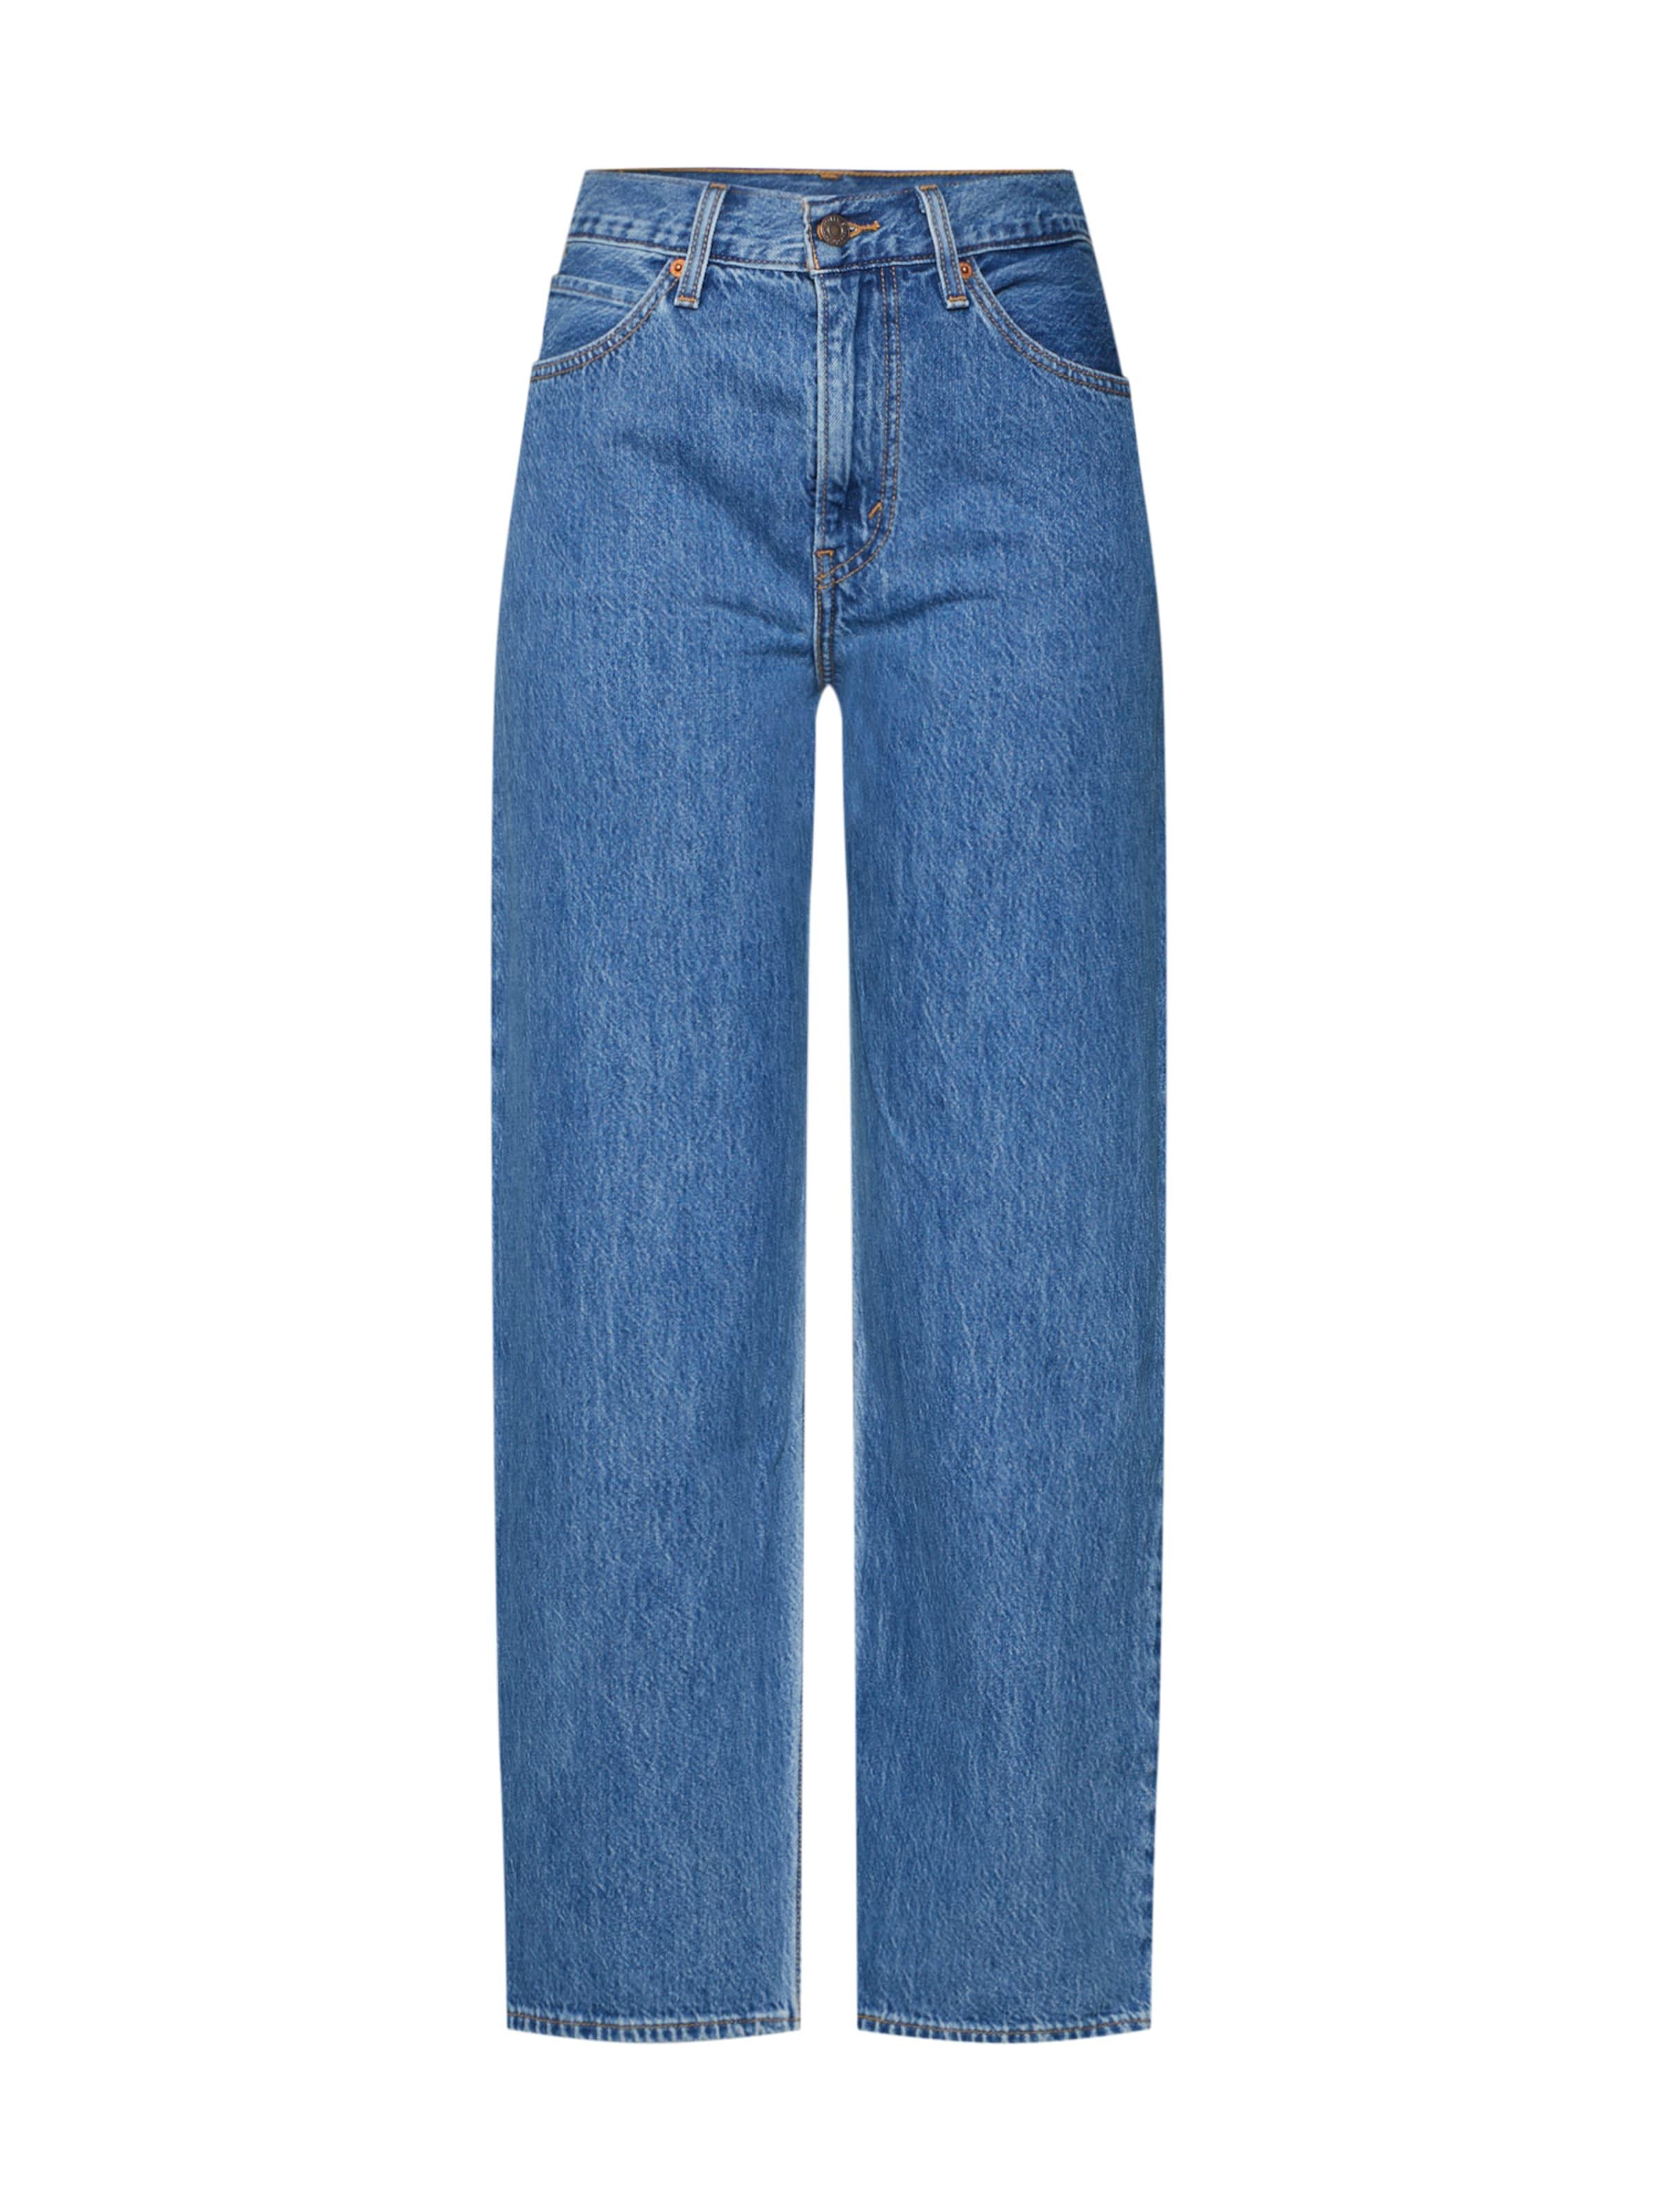 Denim Jean' Jeans 'dad Levi's In Blue 4AjRL35q